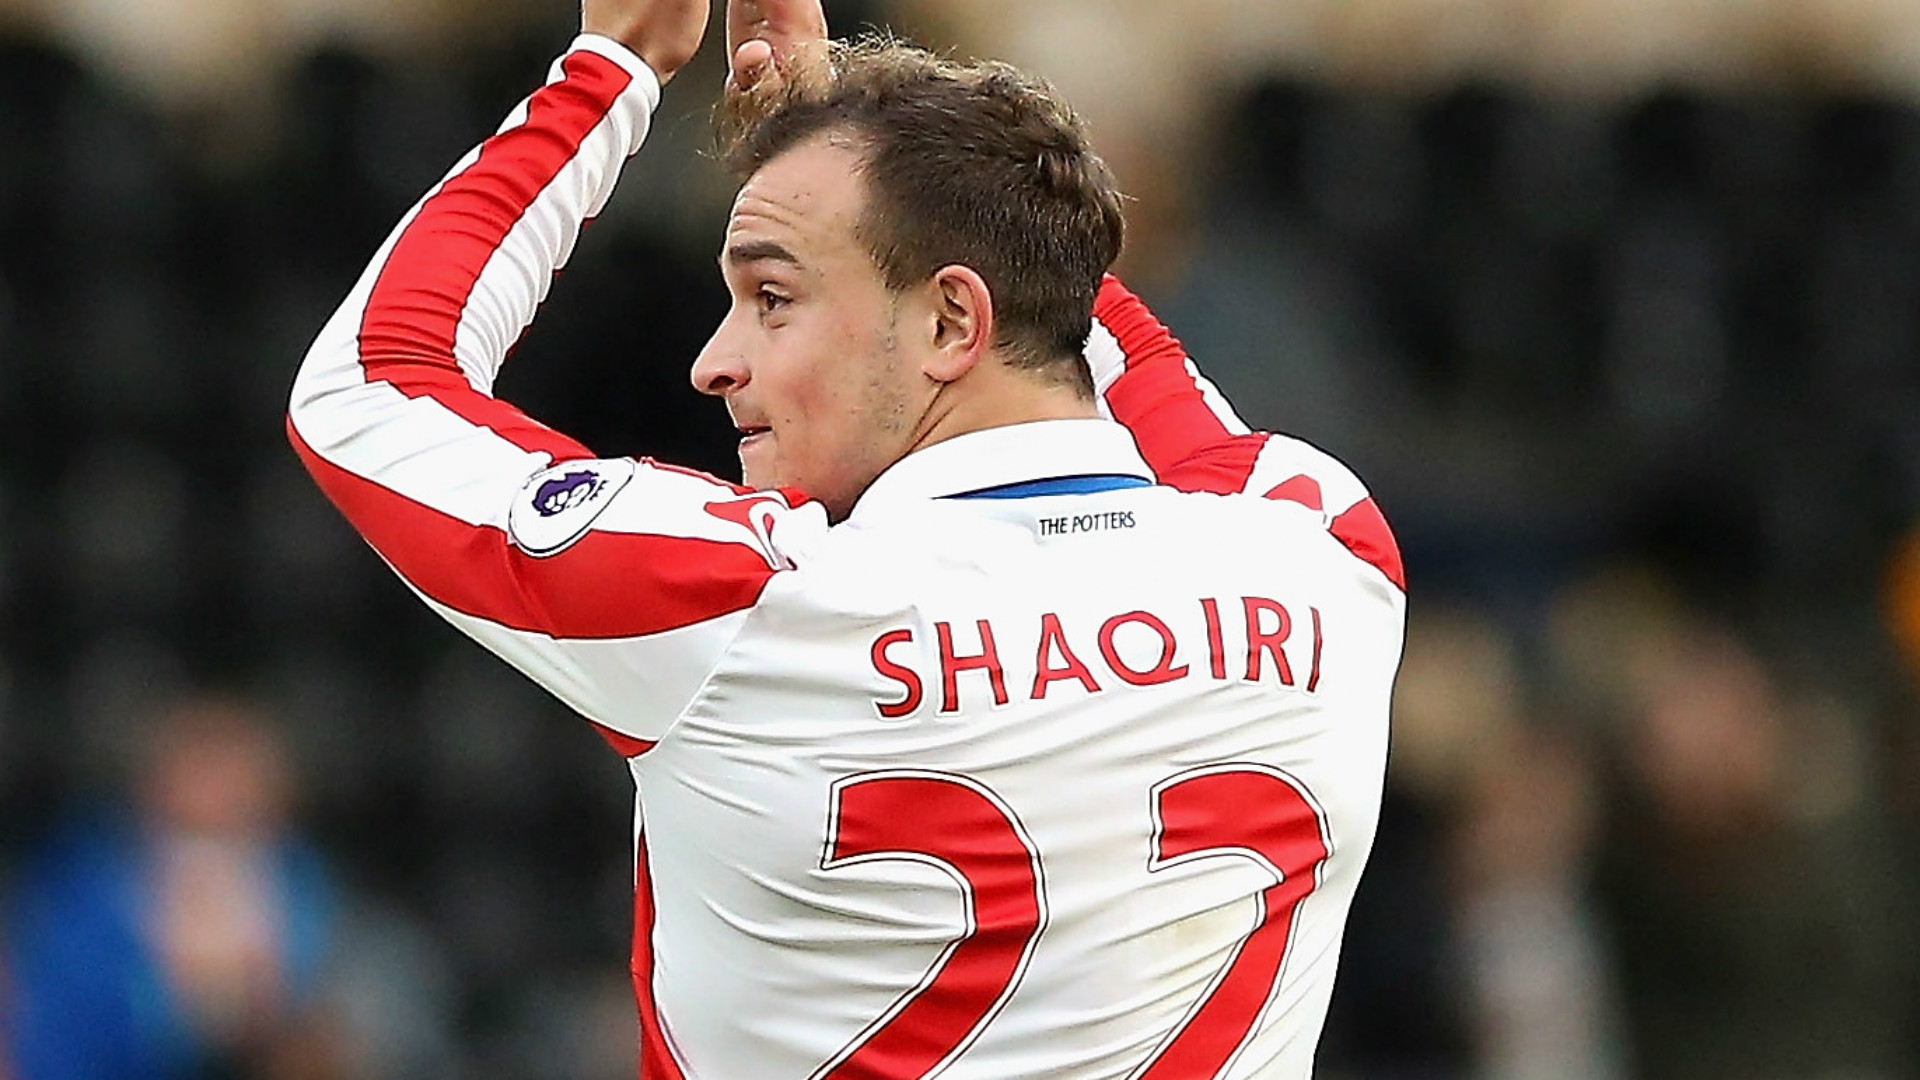 Bayern Liverpool Detail: Bayern Blocked Liverpool Move, Admits Shaqiri